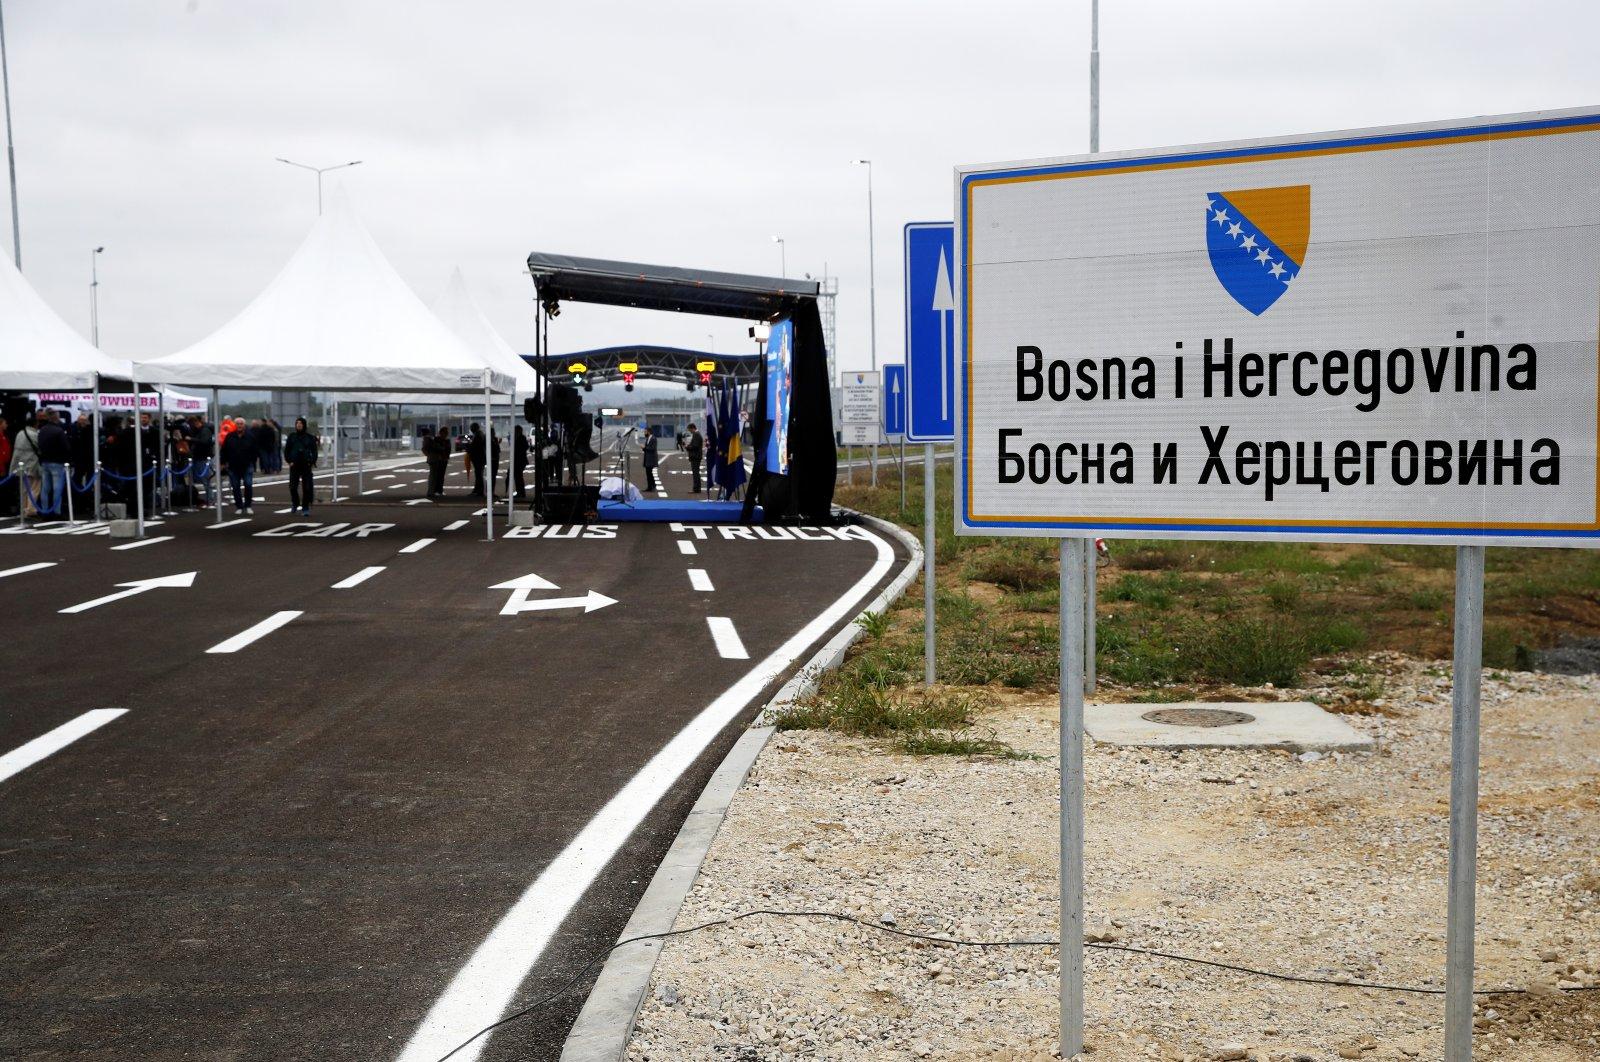 The new border crossing between Croatia and Bosnia and Herzegovina near Svilaj town, Croatia, Sept. 30, 2021. (EPA Photo)